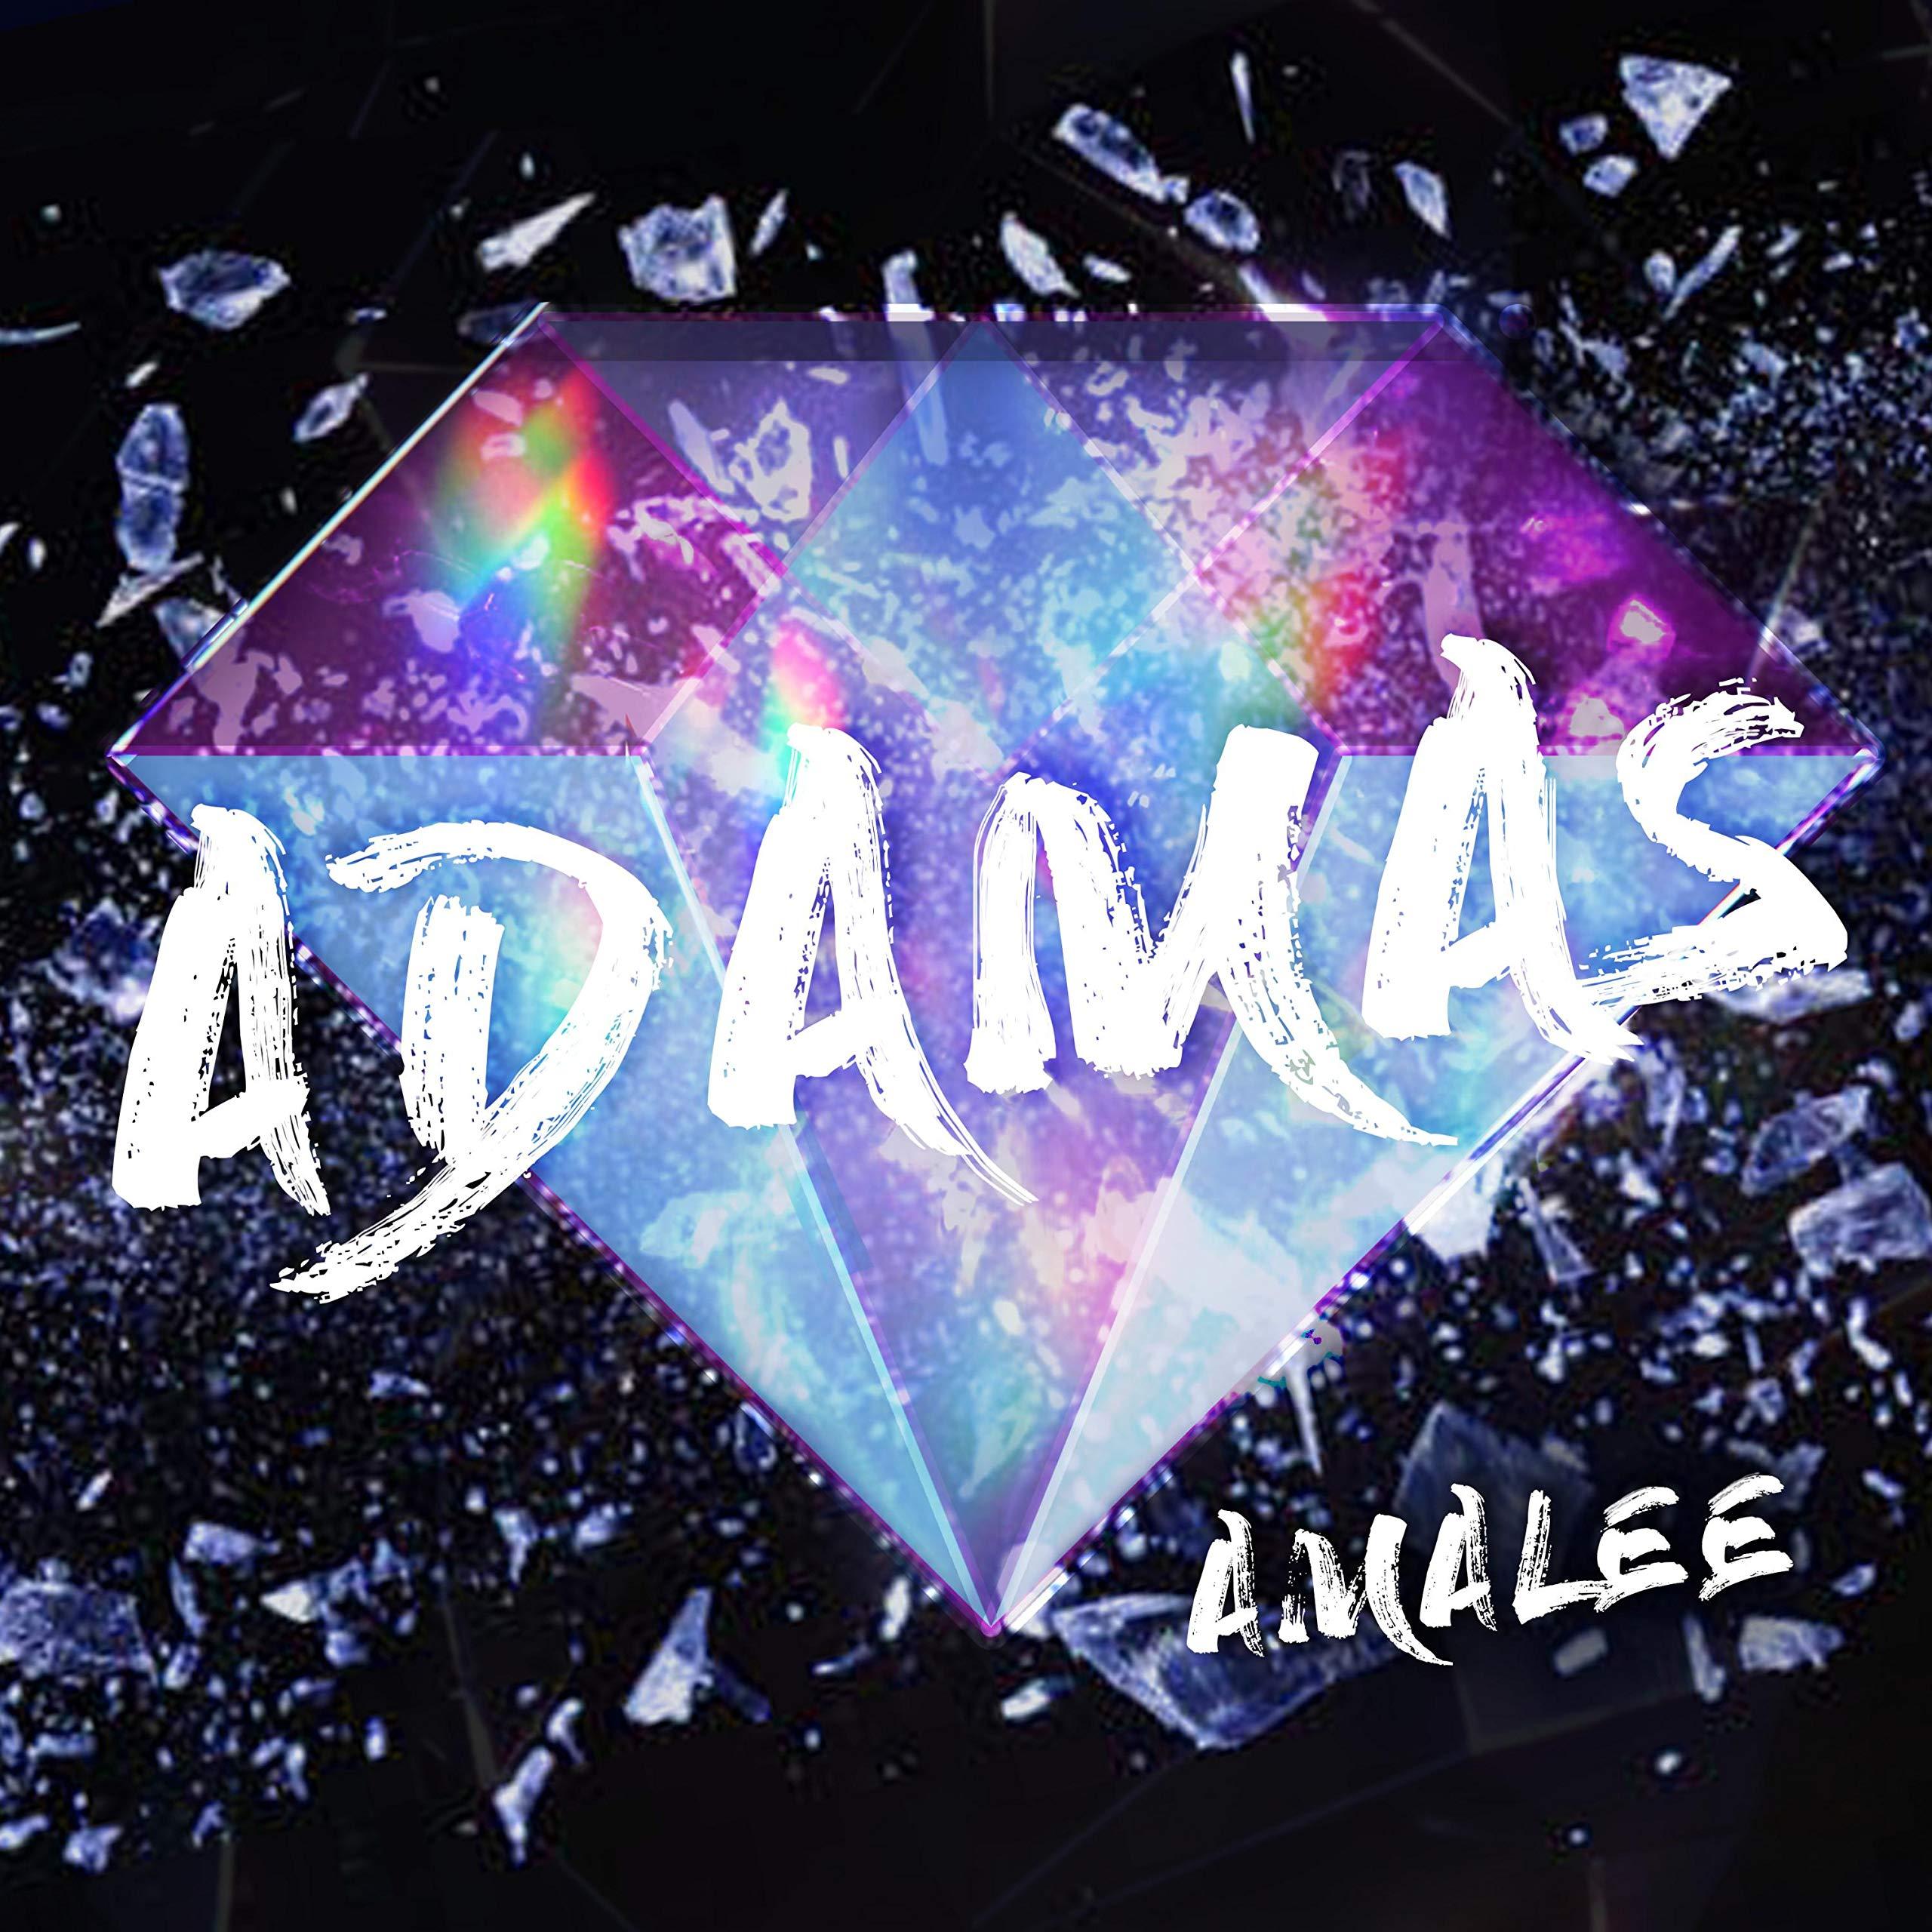 Buy Adamas Now!